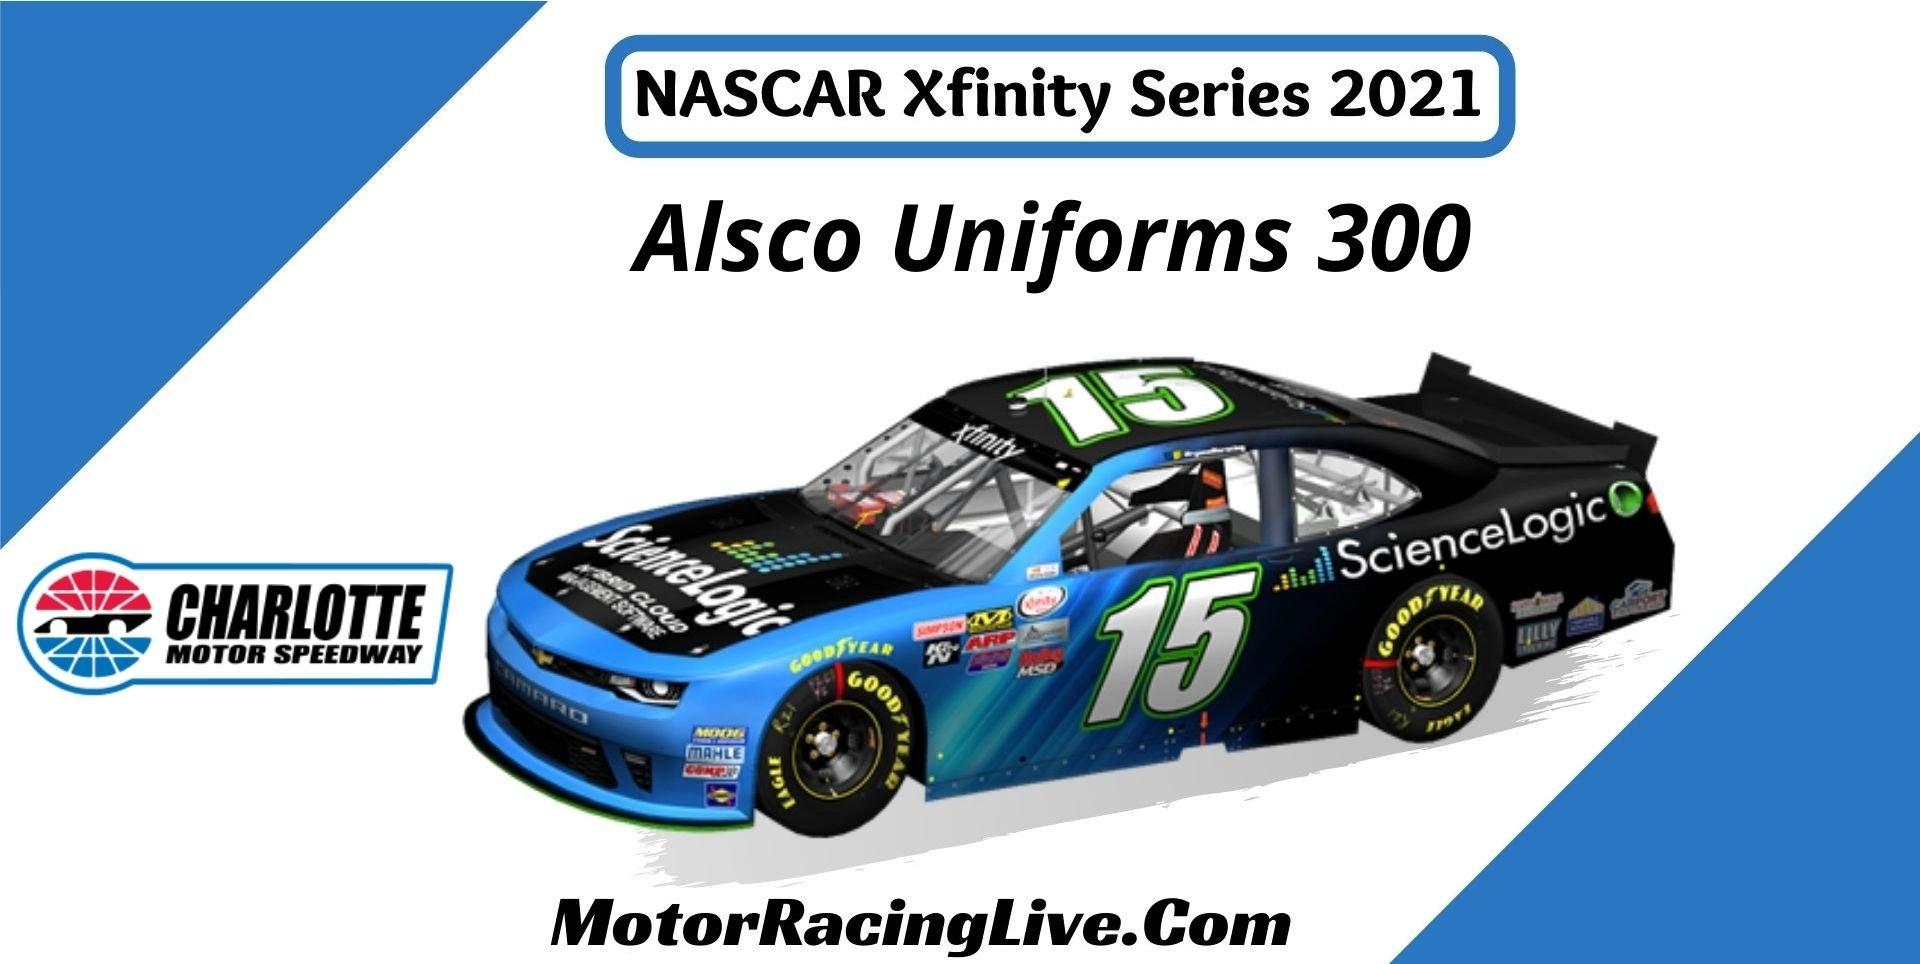 Alsco Uniforms 300 Nascar Xfinity Series 2021 Live Stream